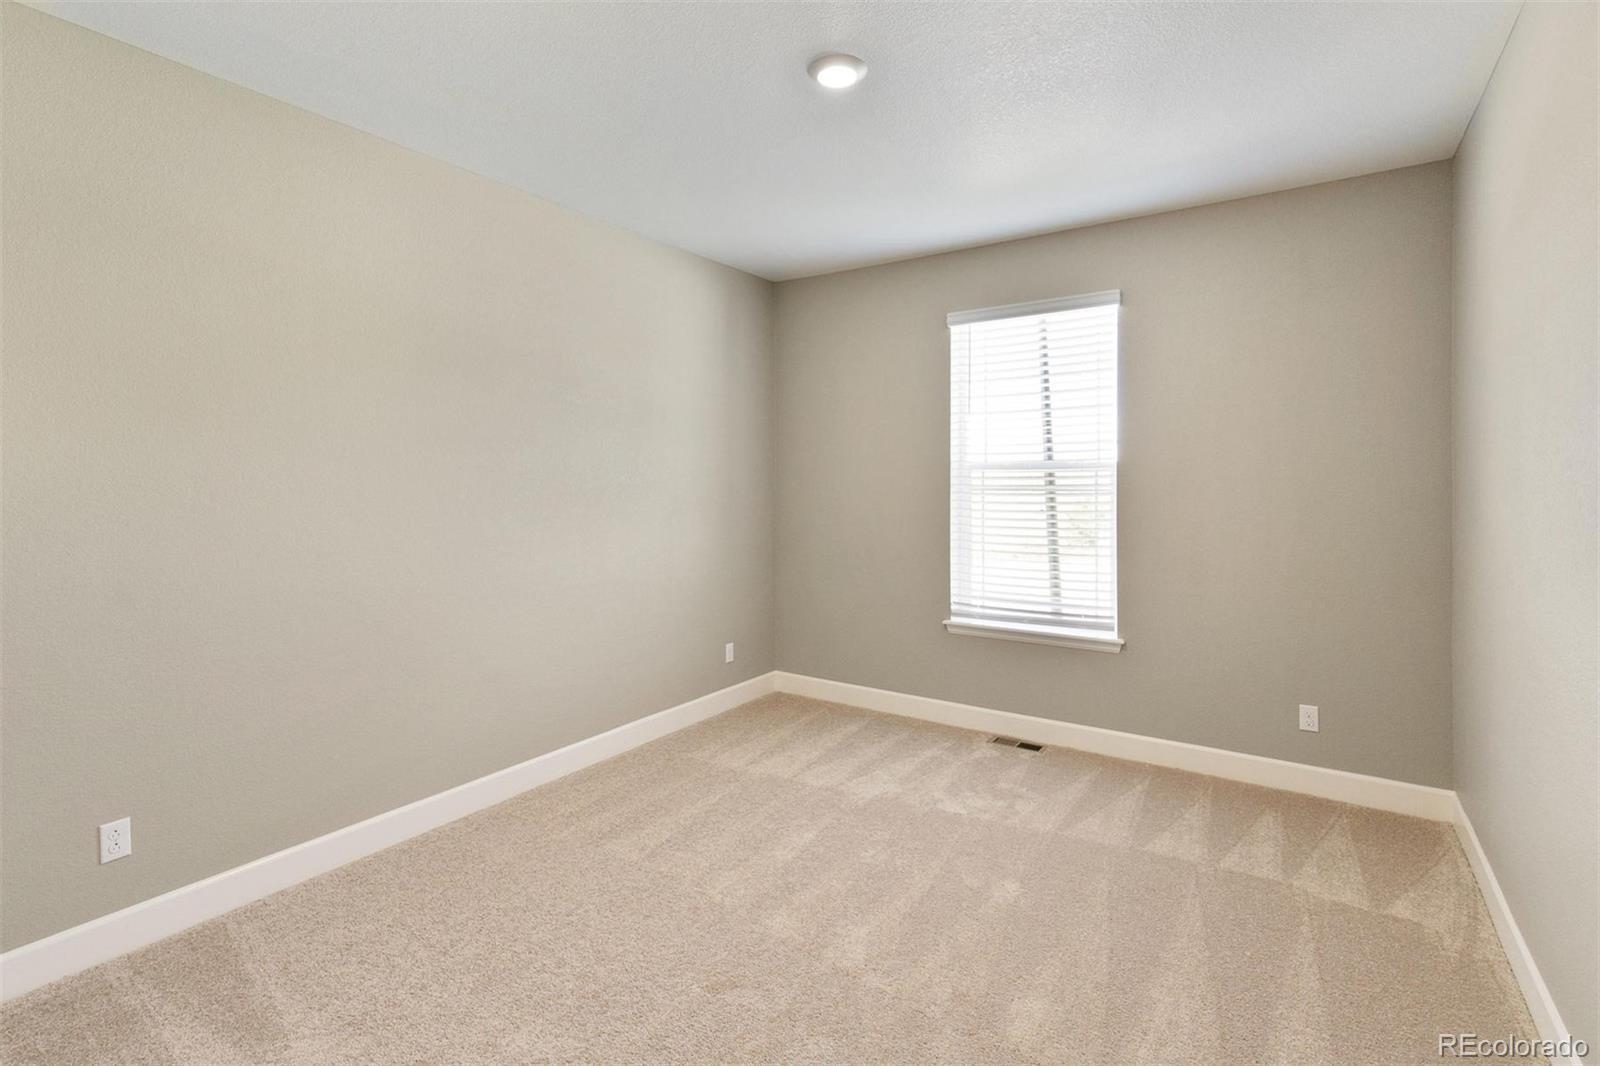 MLS# 9076258 - 23 - 1838 Pinion Wing Circle, Castle Rock, CO 80108